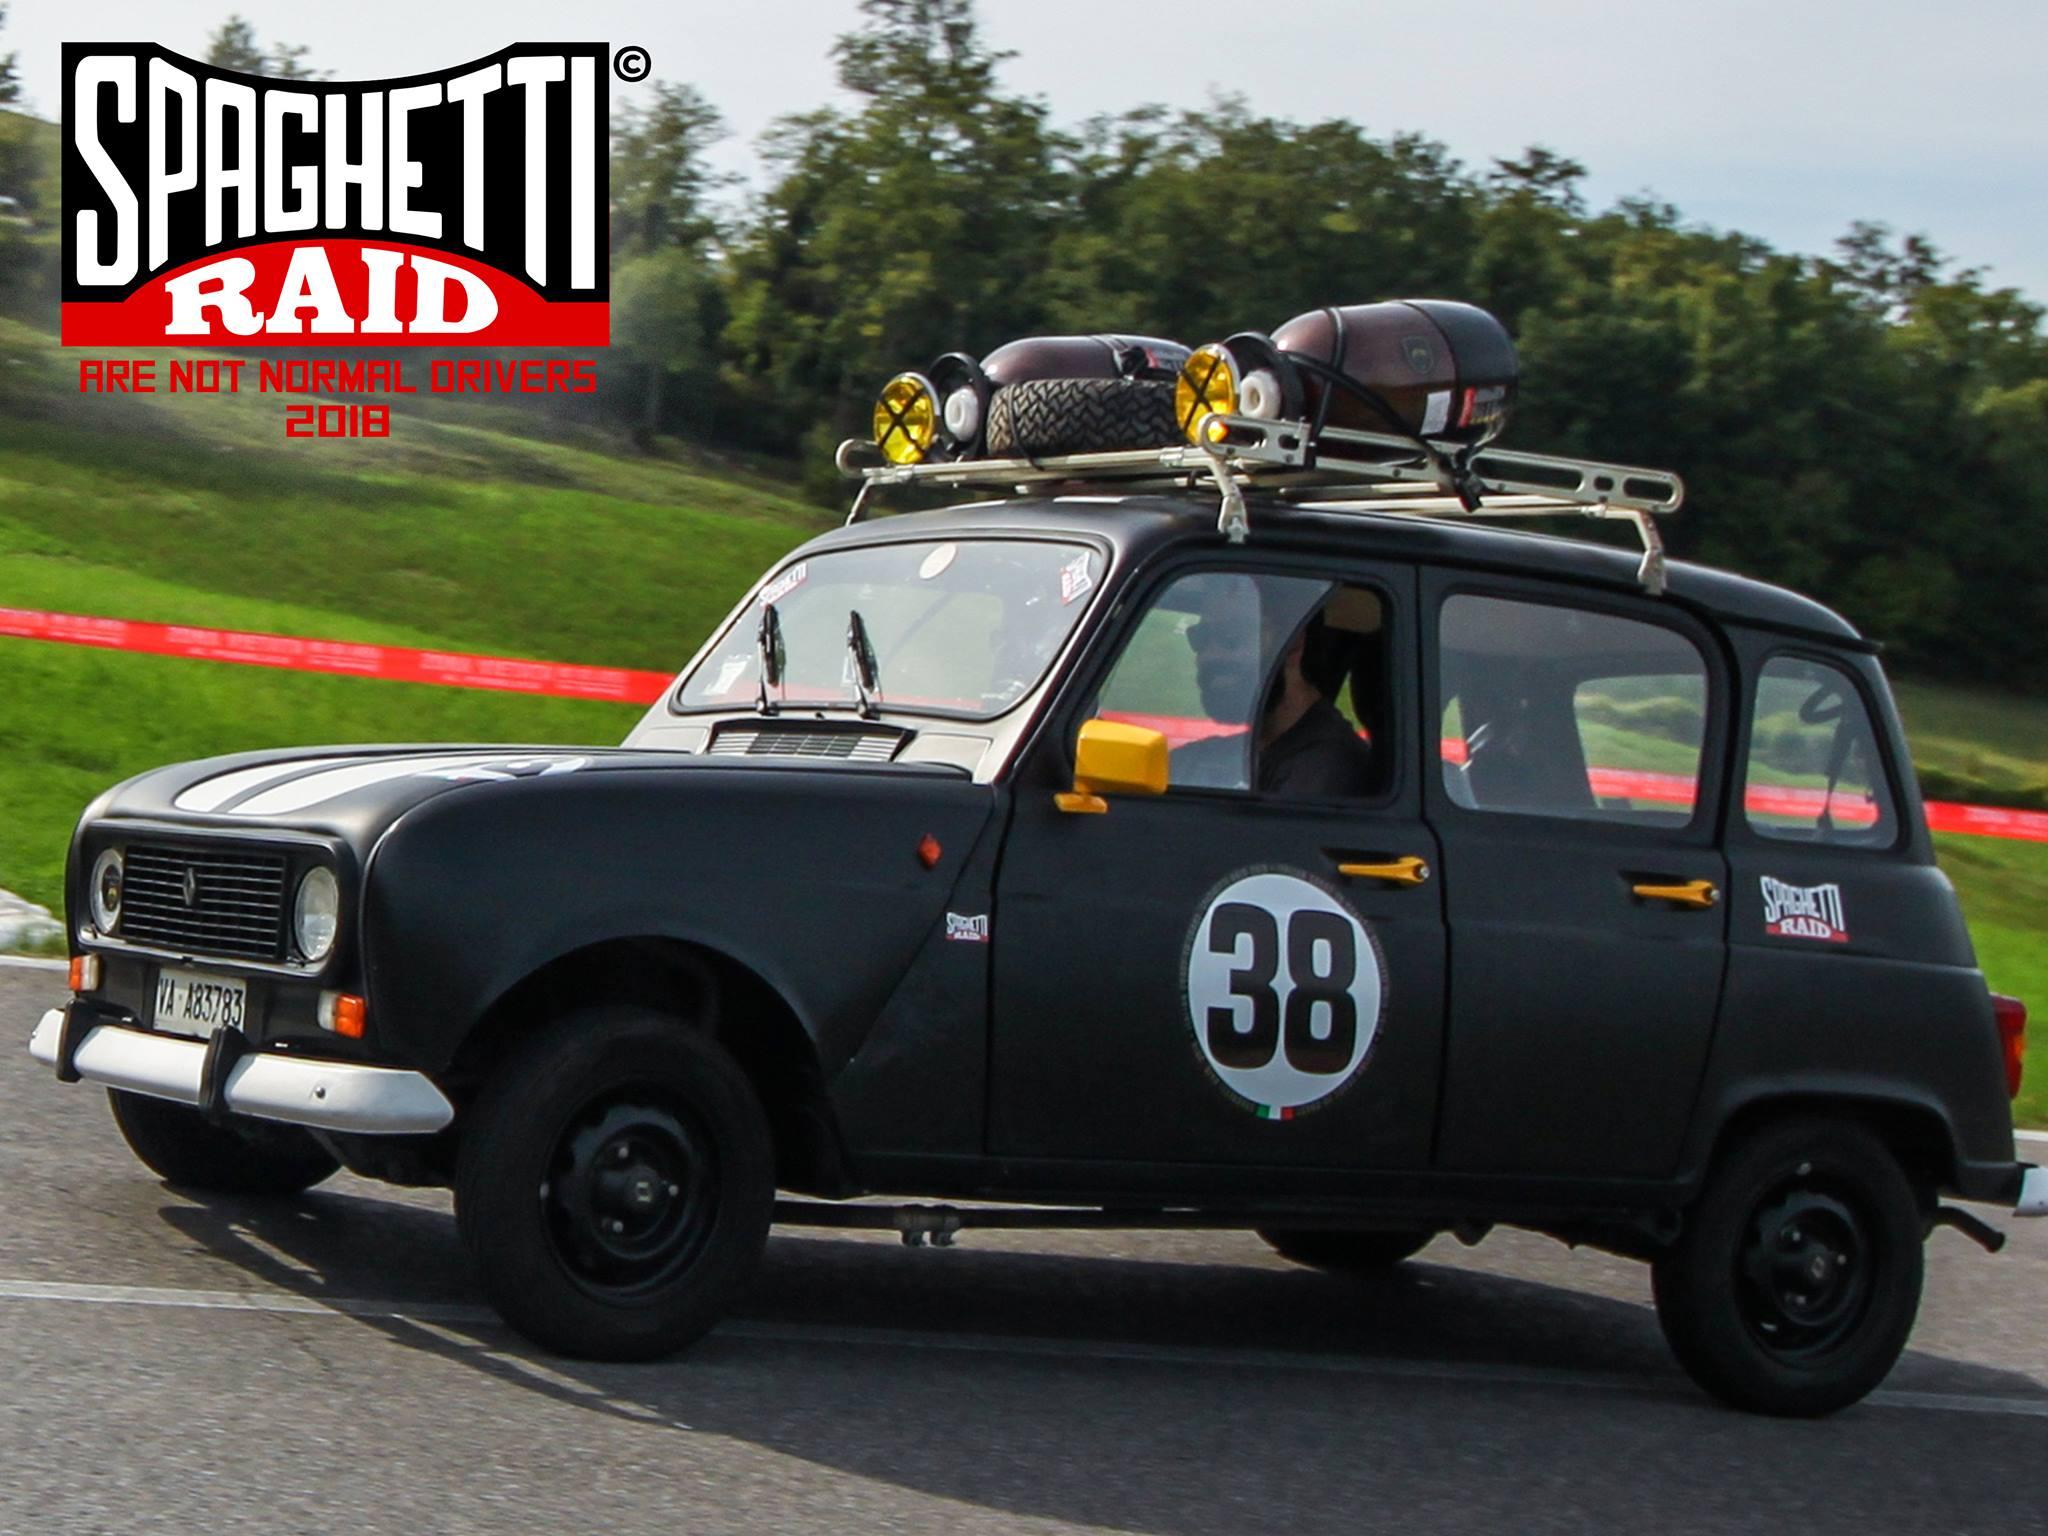 Team ROAD MOTOR #38 RENAULT 4 TL 950cc del '89 Città: Misano Adriatico RN